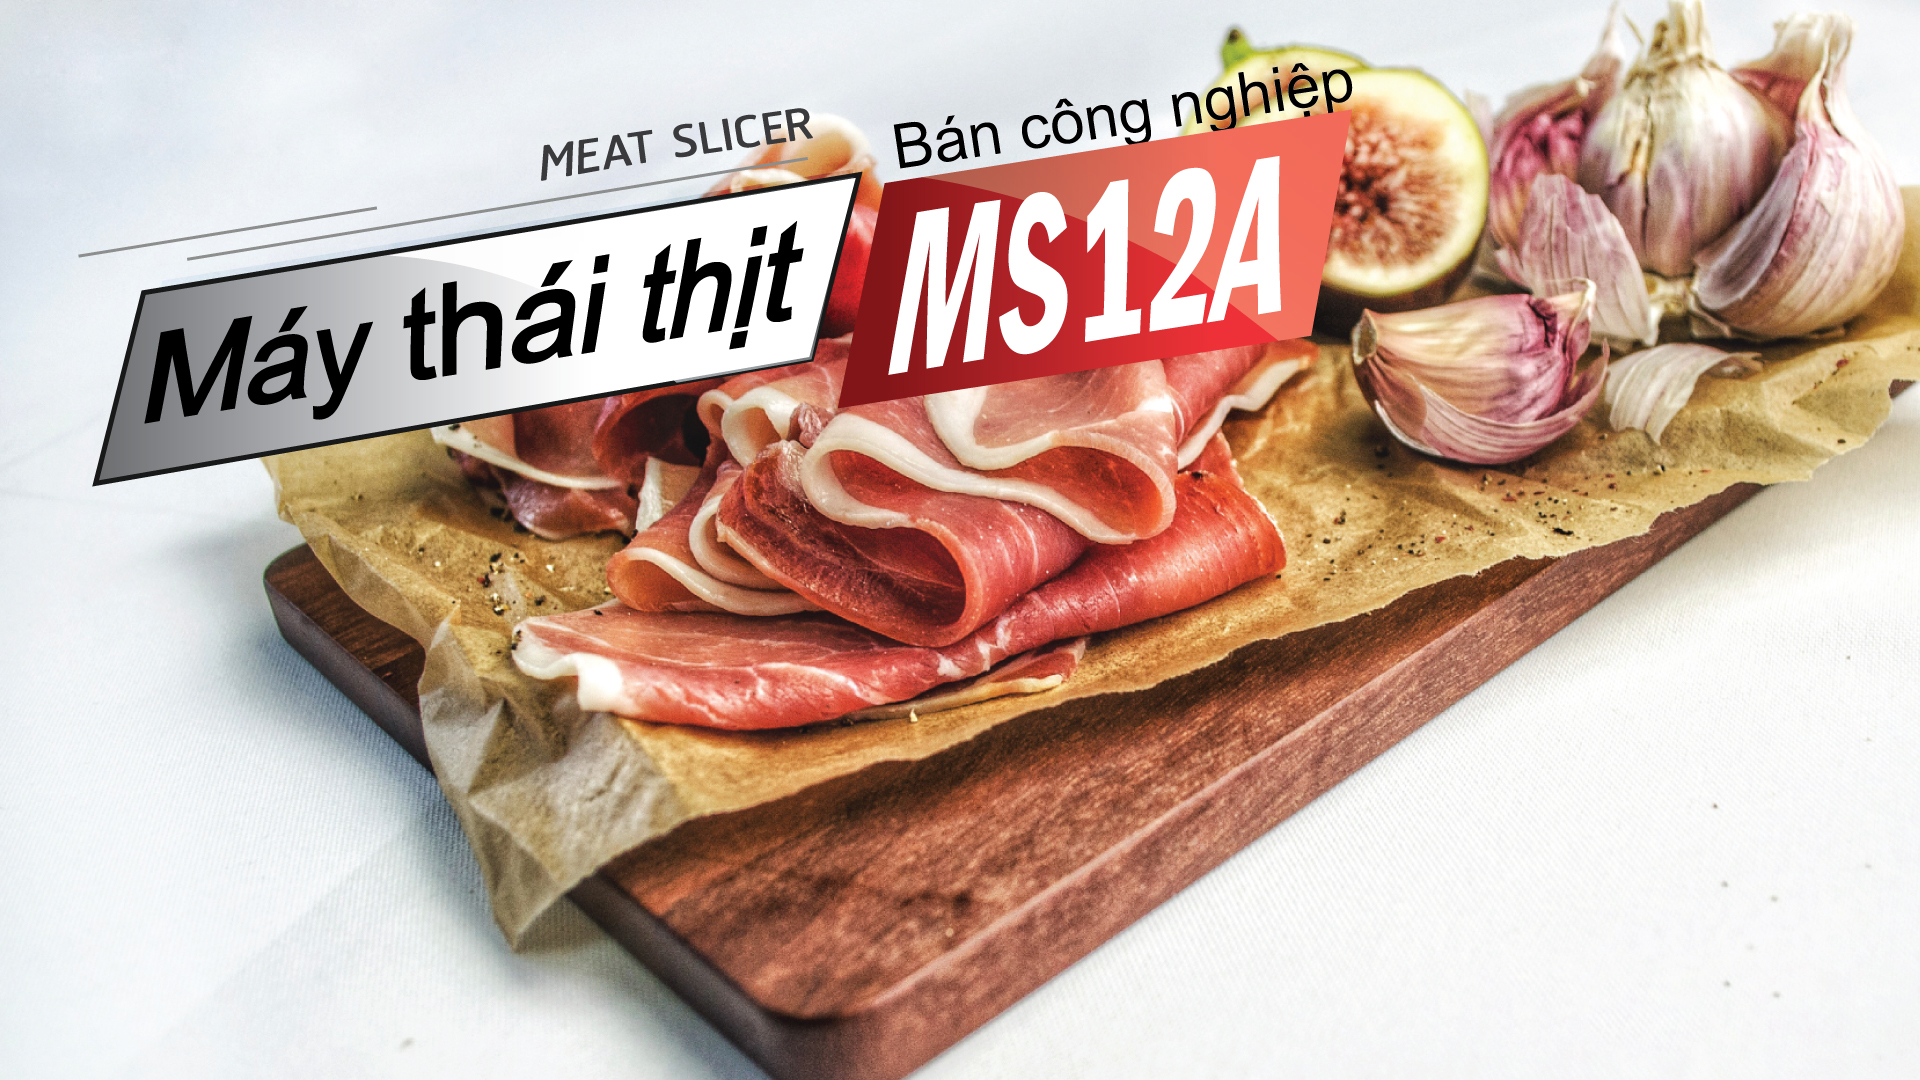 máy cắt thịt-ms12a-pro-p.2